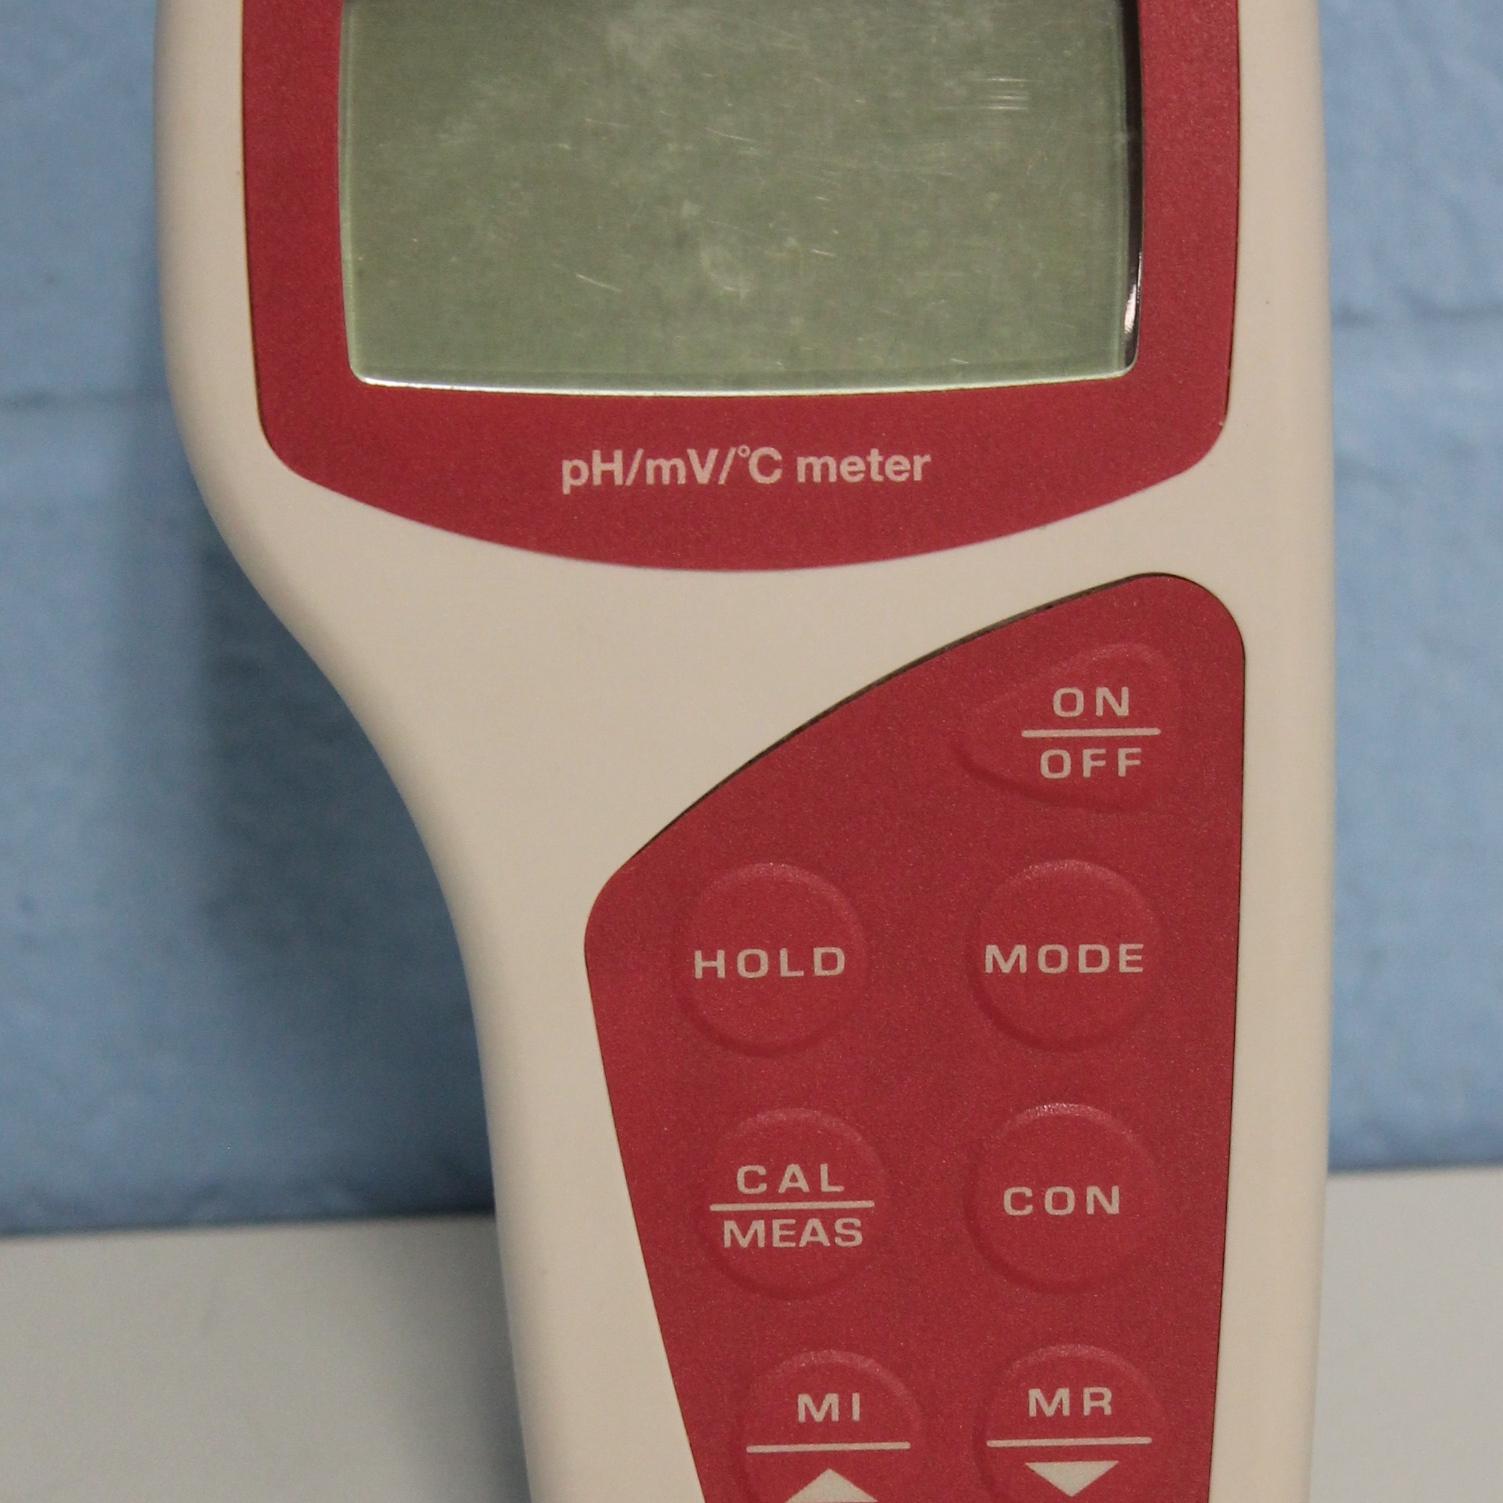 Oakton pH/mV/C Meter Image